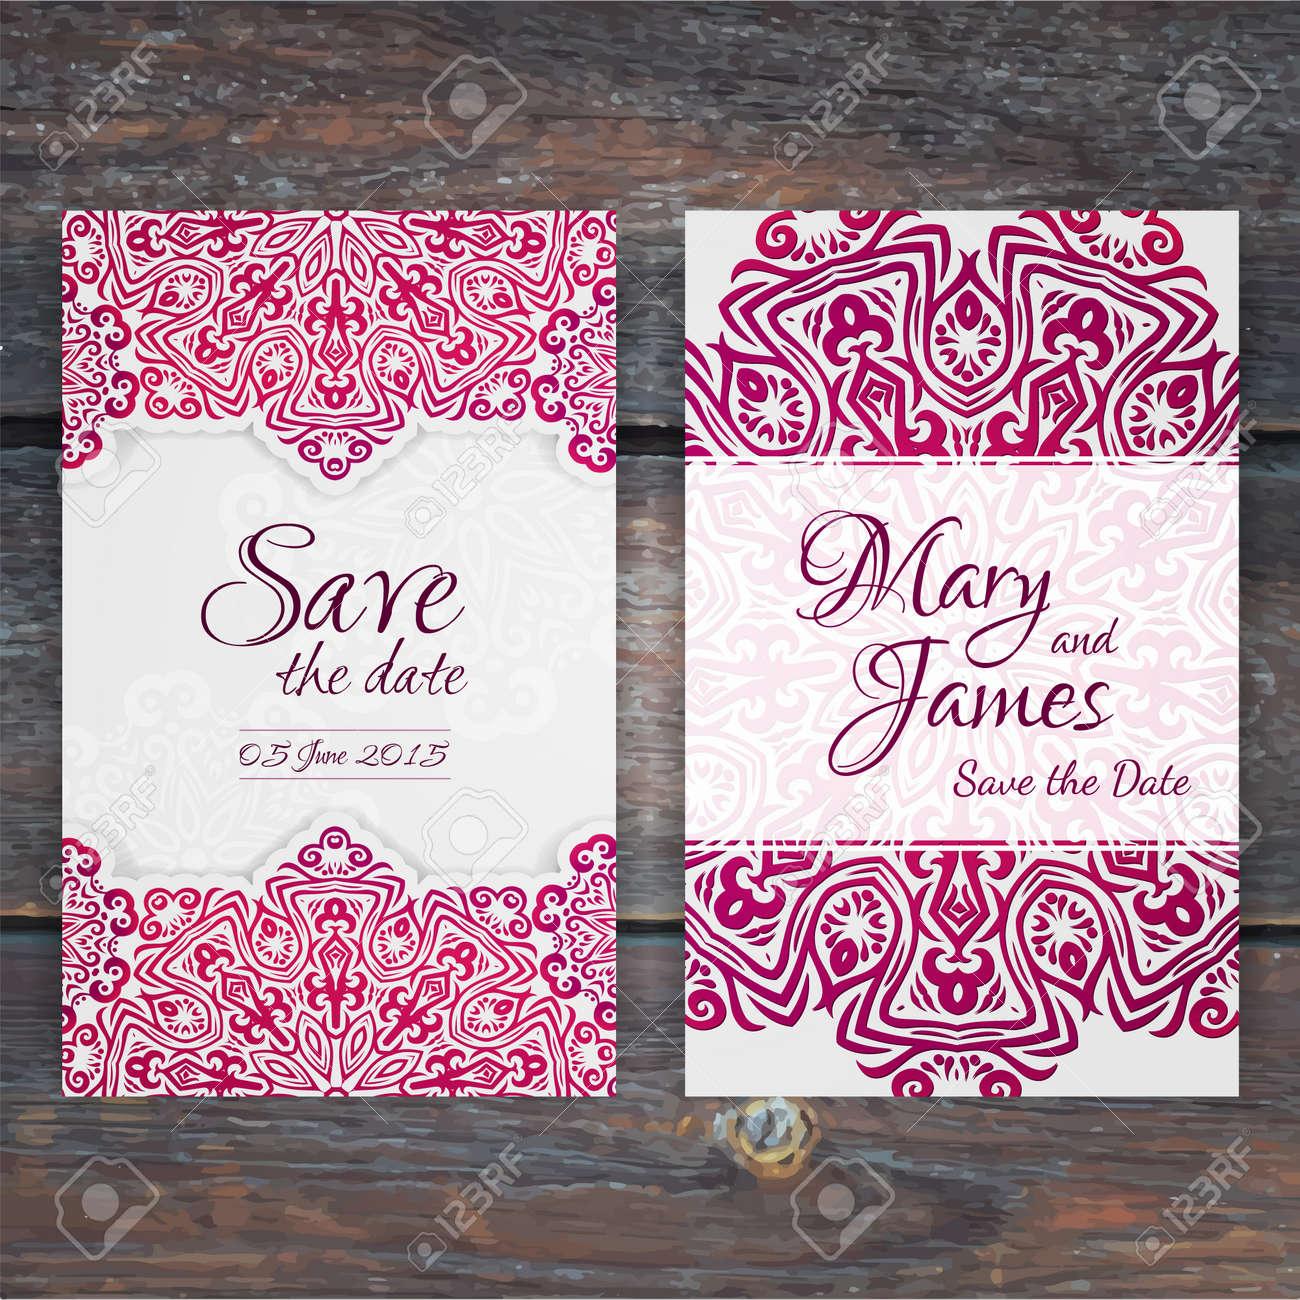 Lacy Vector Wedding Card Template. Romantic Vintage Wedding ...